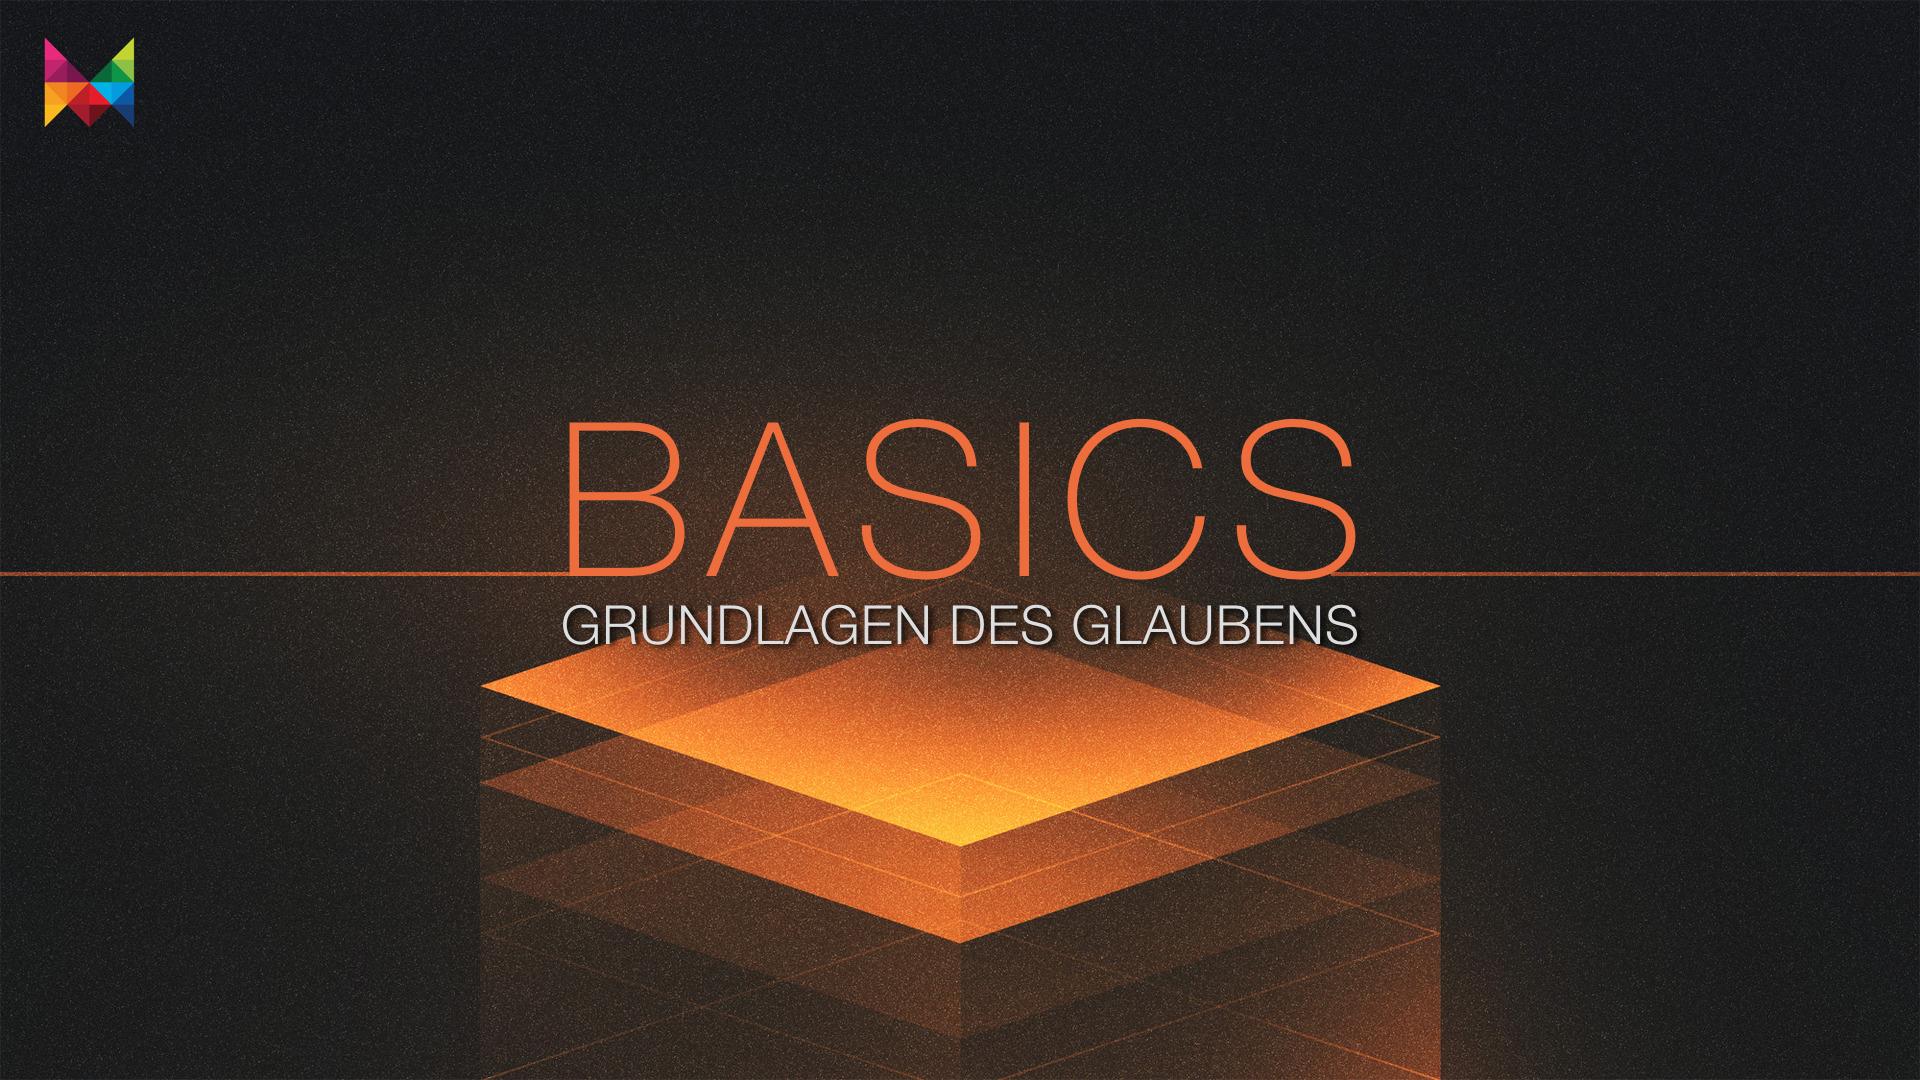 BASICS. Gesandt 06